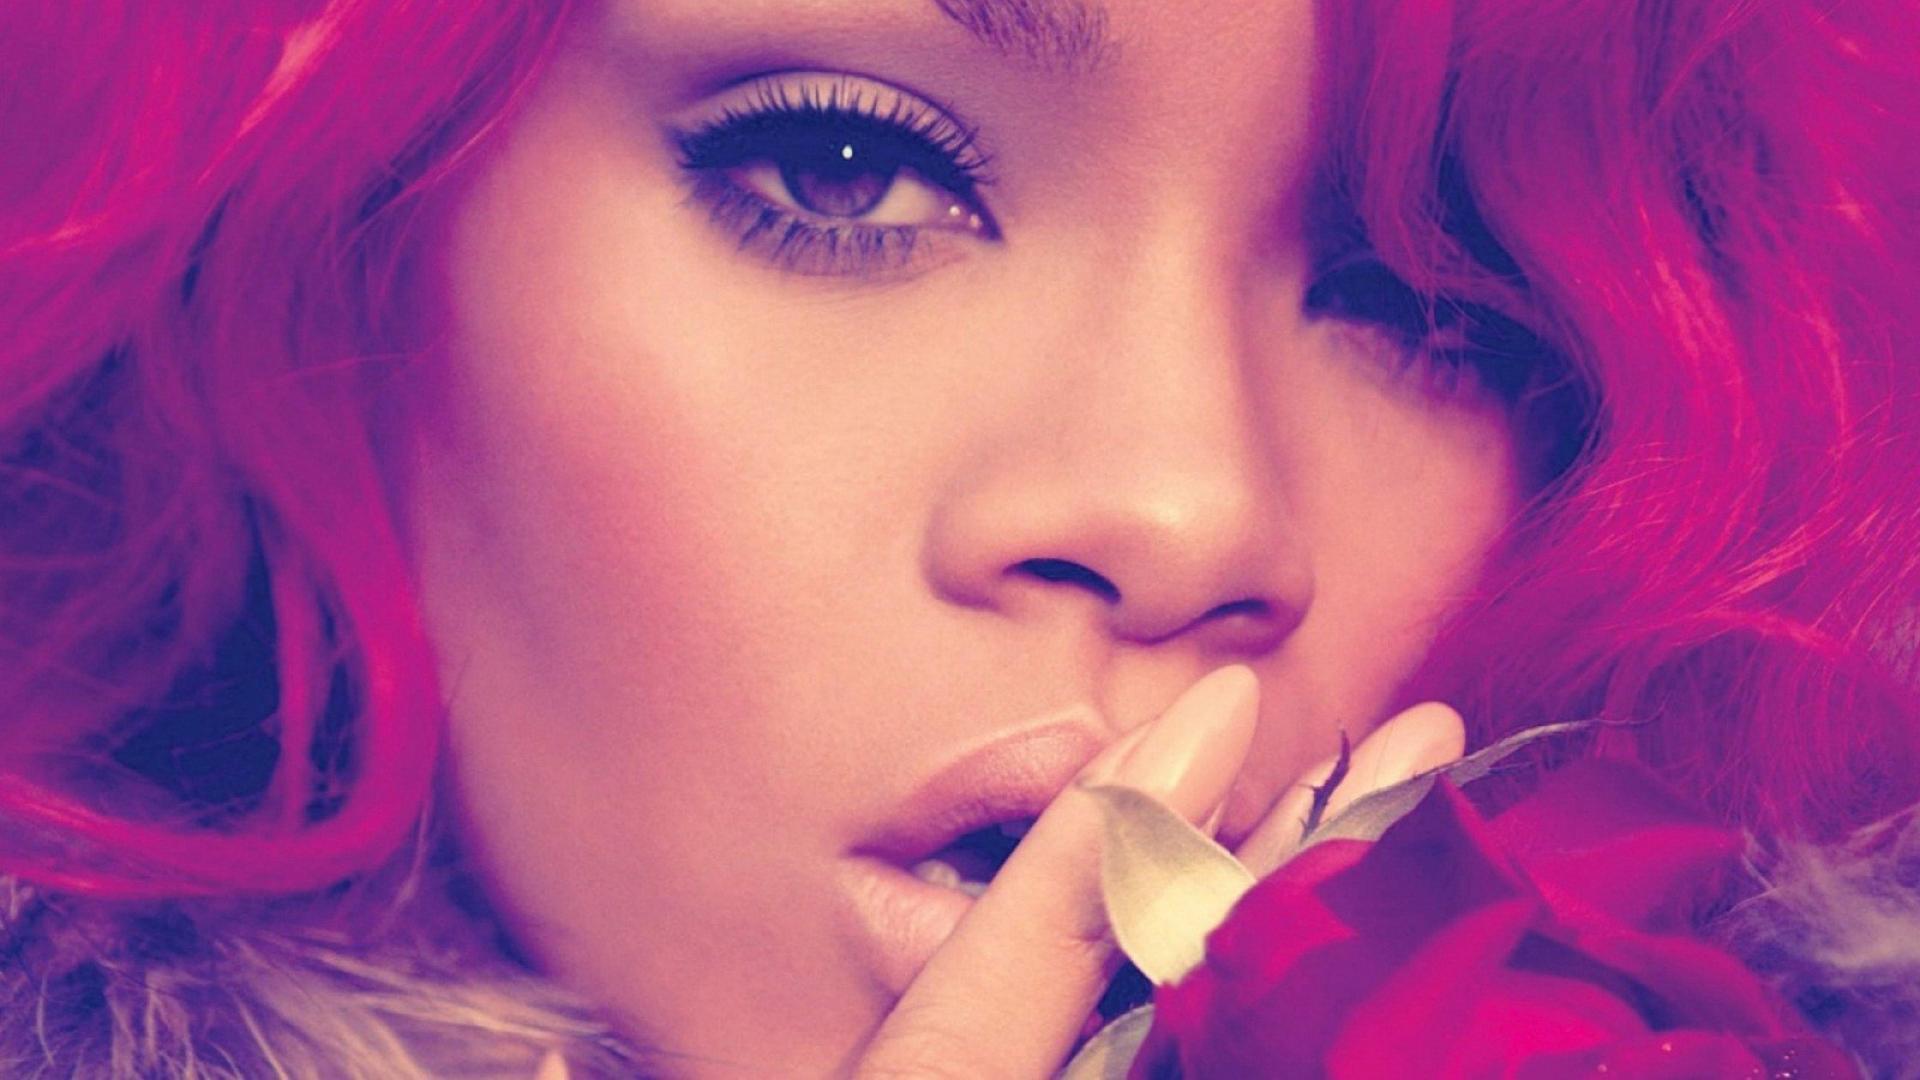 Rihanna albums artist wallpaper 17497 1920x1080